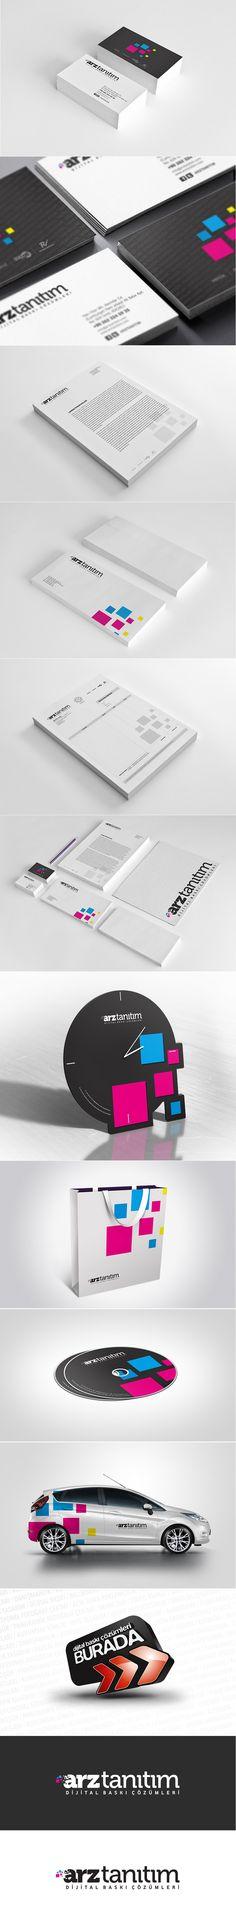 Arz Tanitim Branding Graphic Design by Sedat Gever